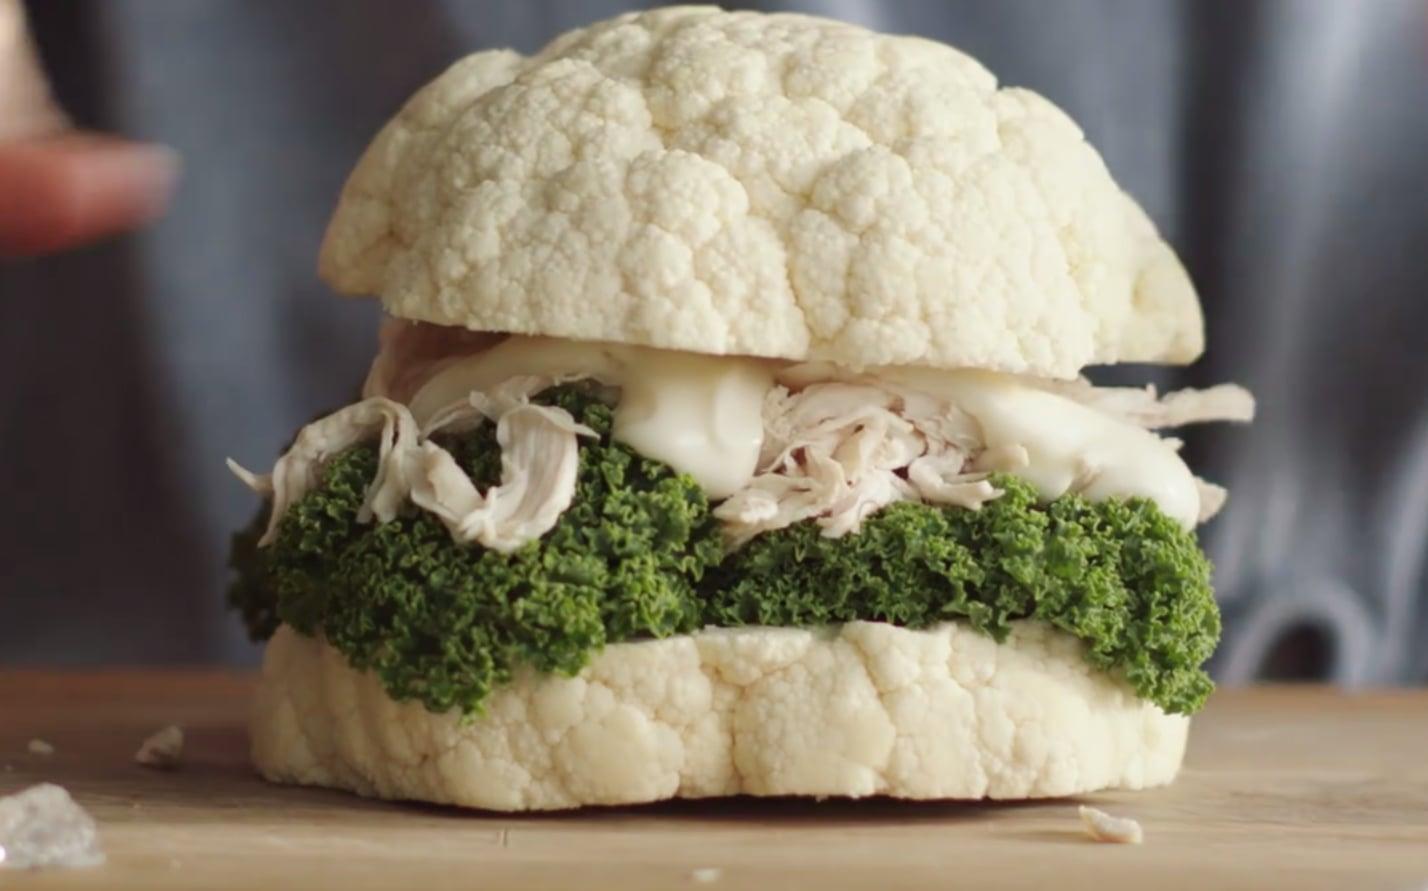 kfc mocks clean eating with dirty louisiana burger advert